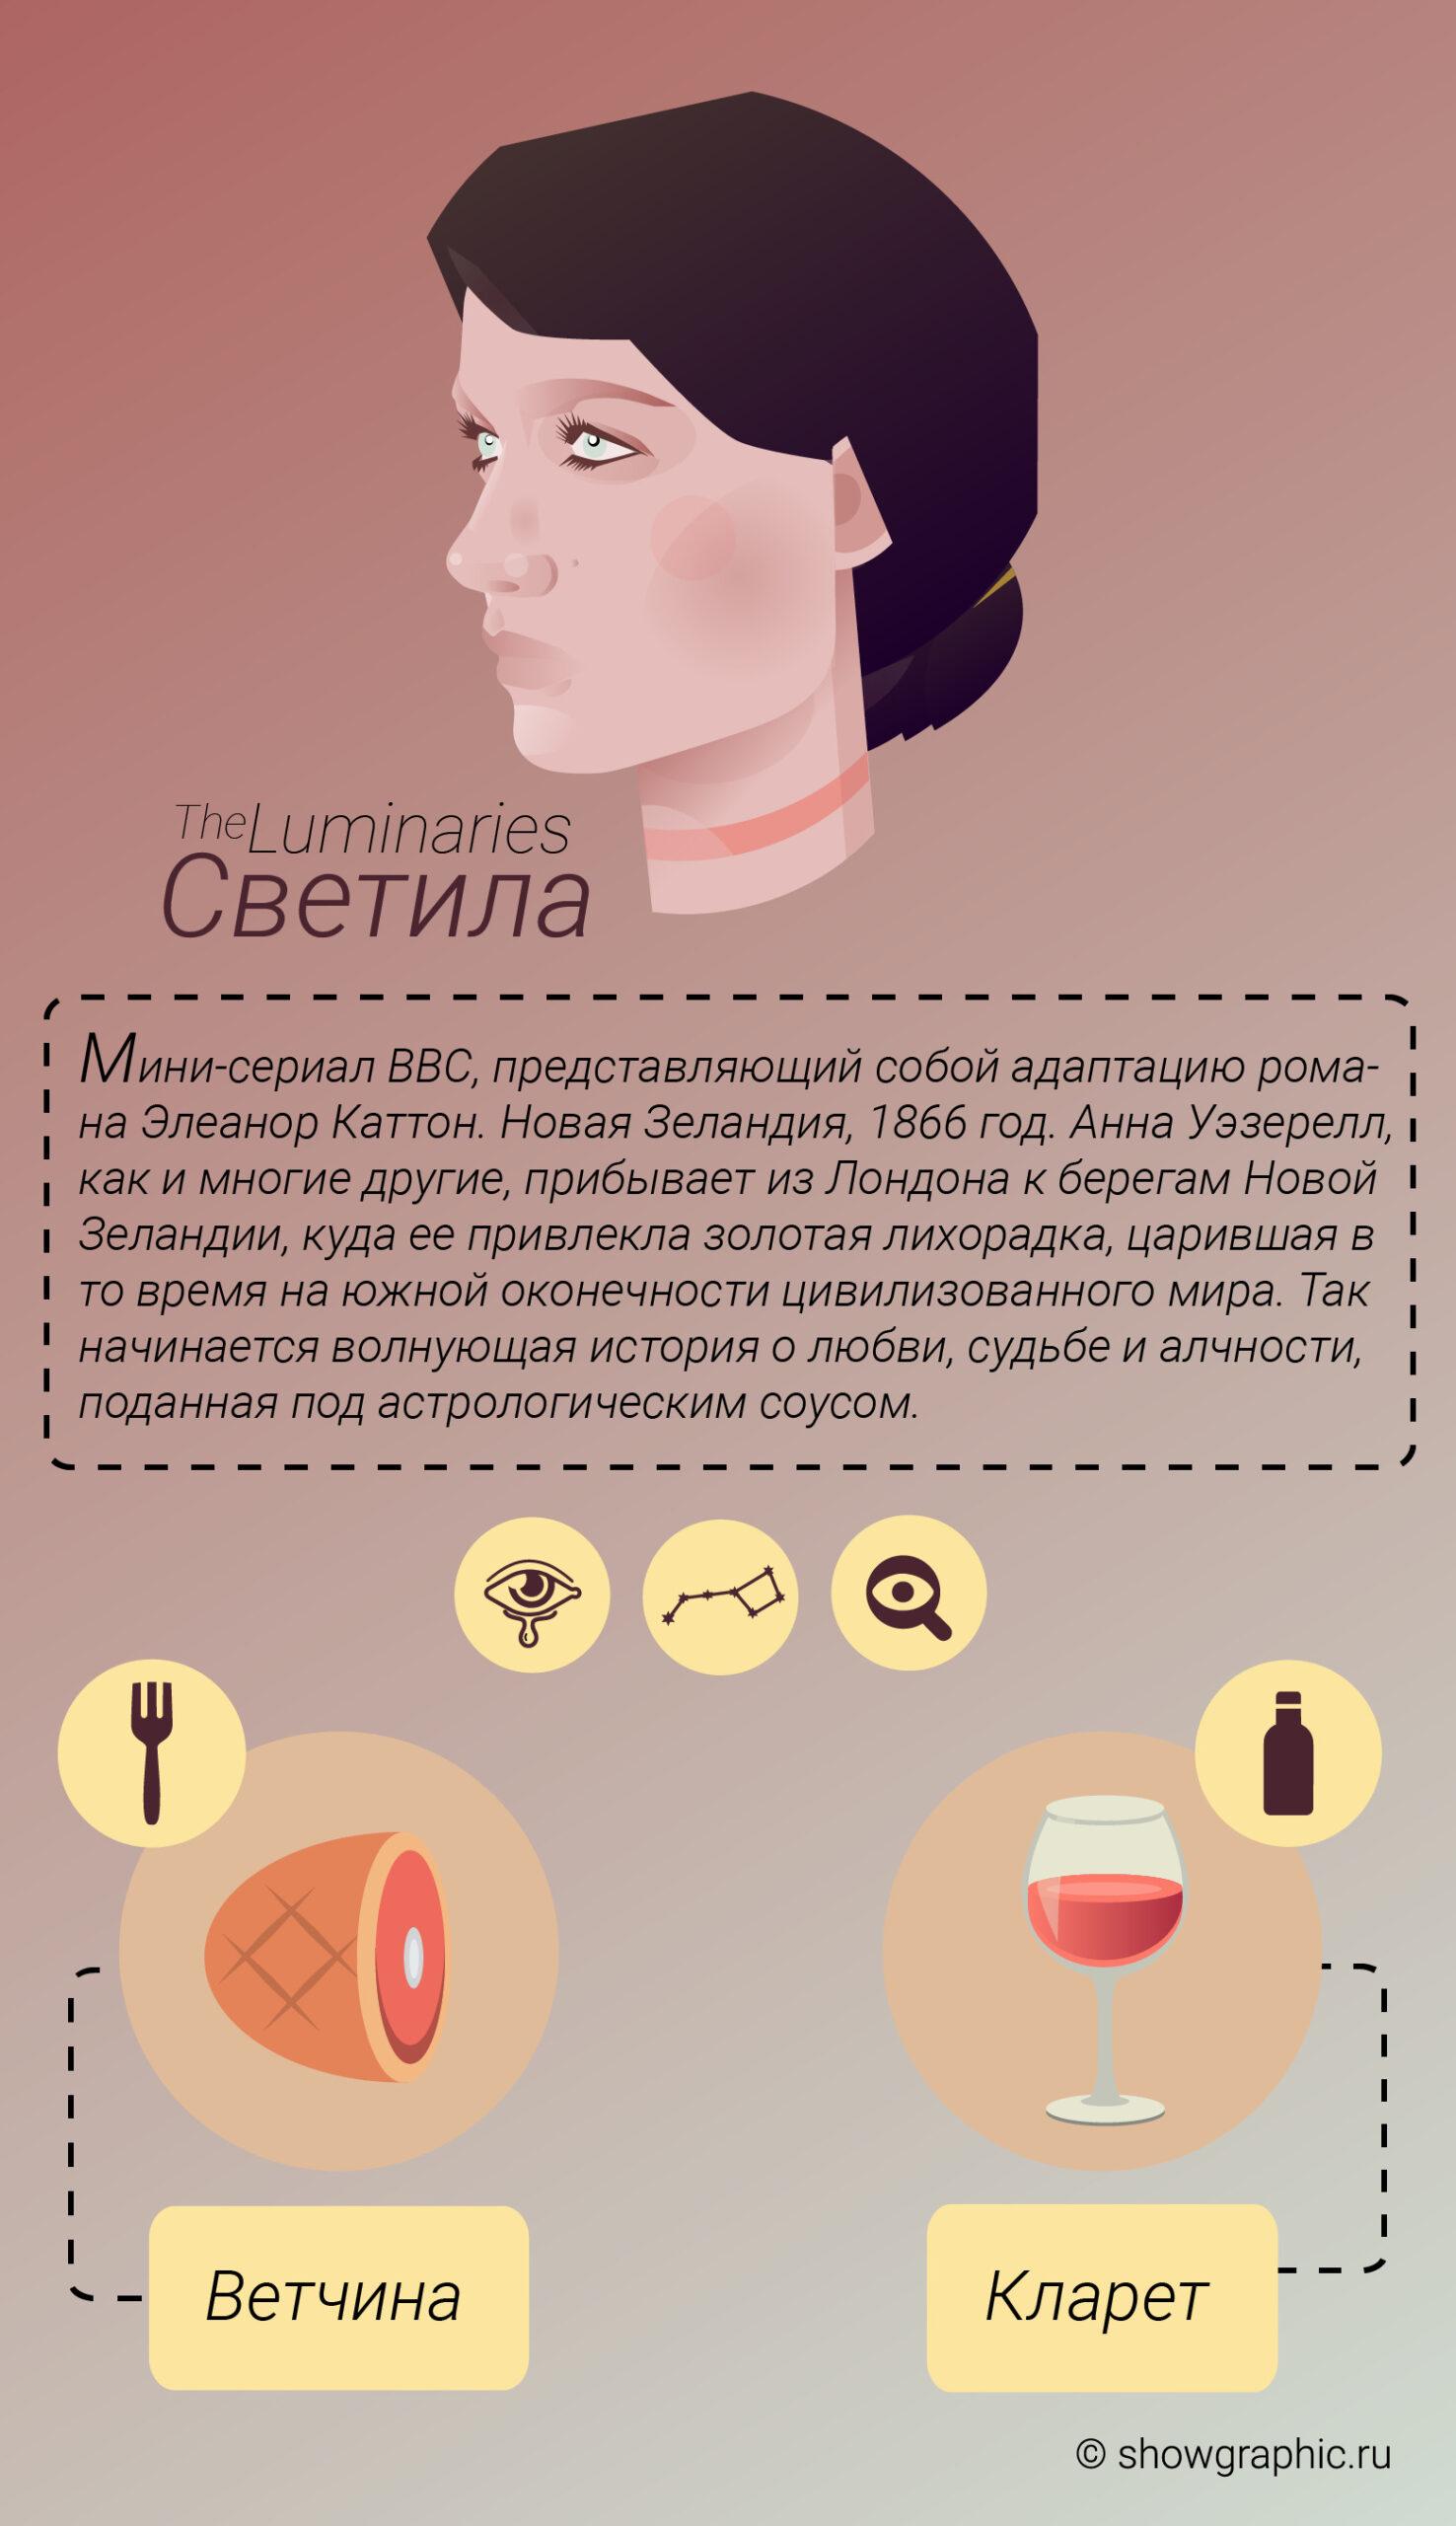 светила инфографика